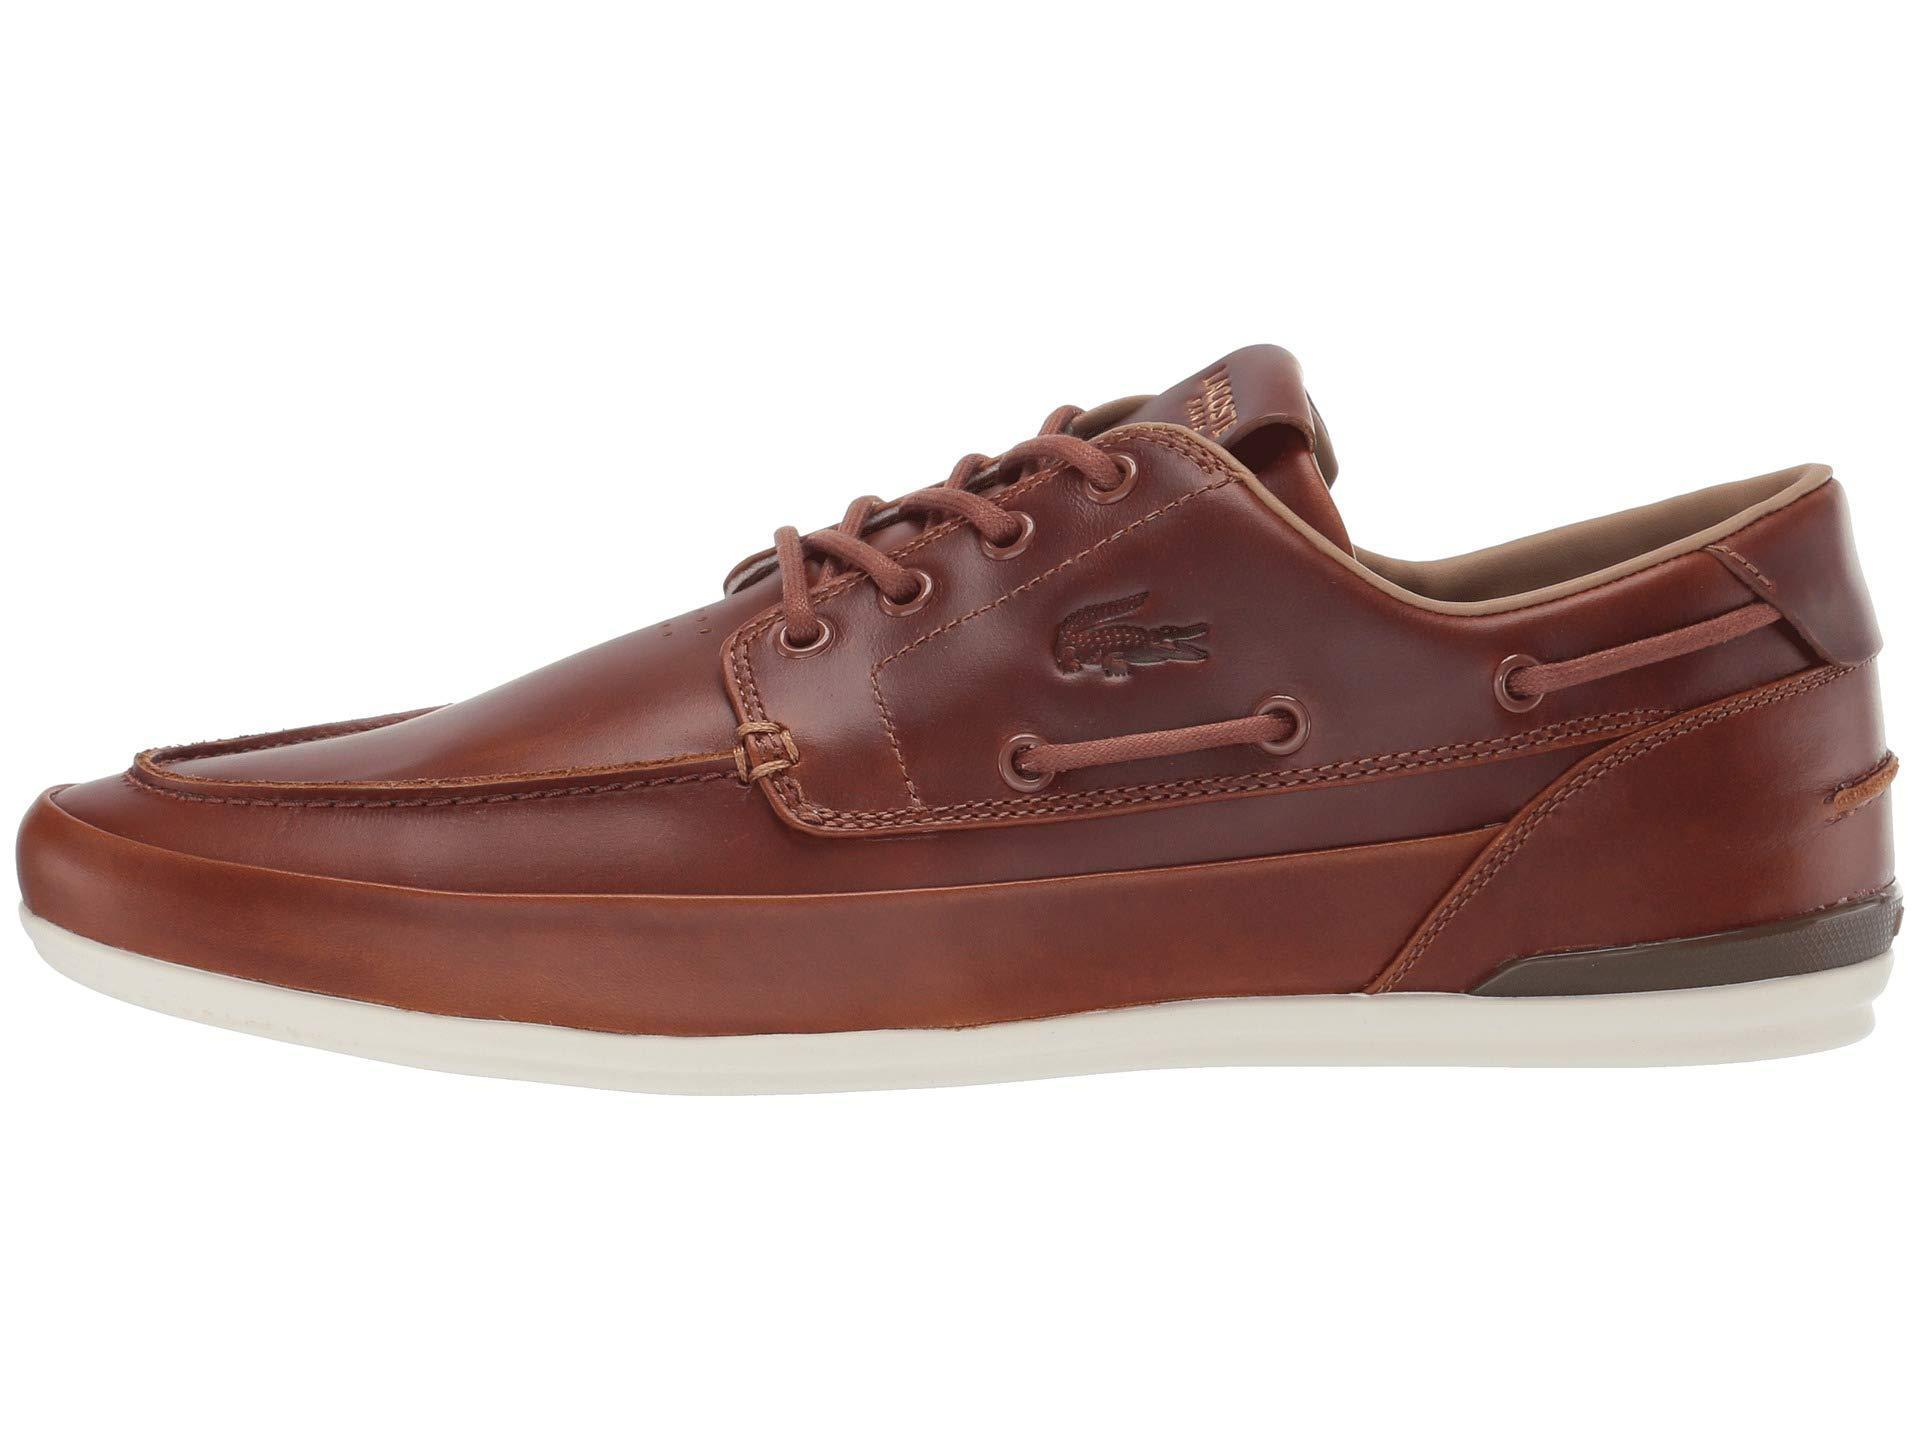 Lacoste Marina 119 6 CMA Boat Shoe Tan//Off White